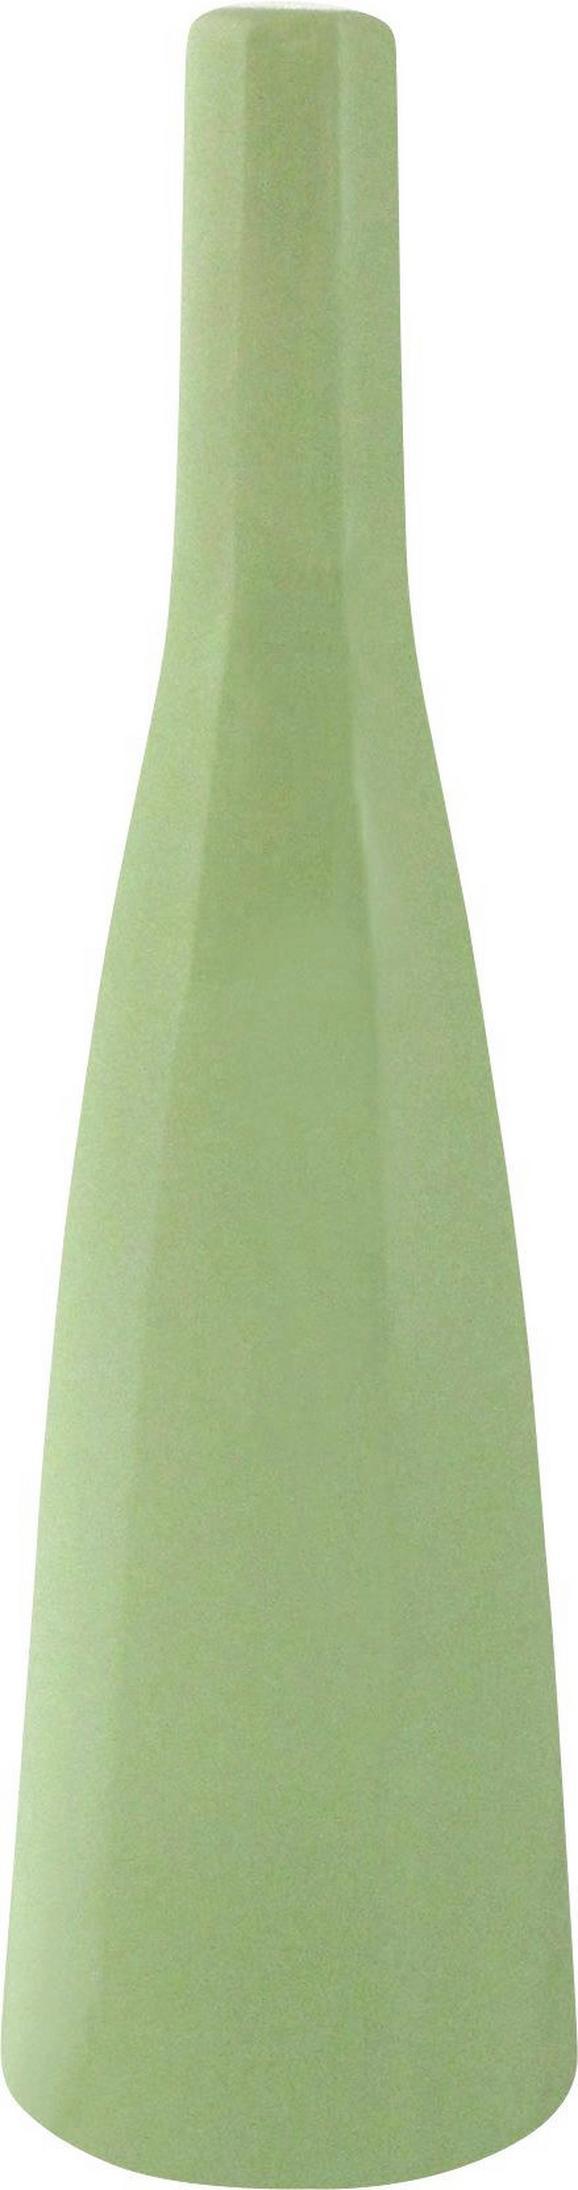 Vaza Plancio - zelena, Romantika, keramika (20,5cm)